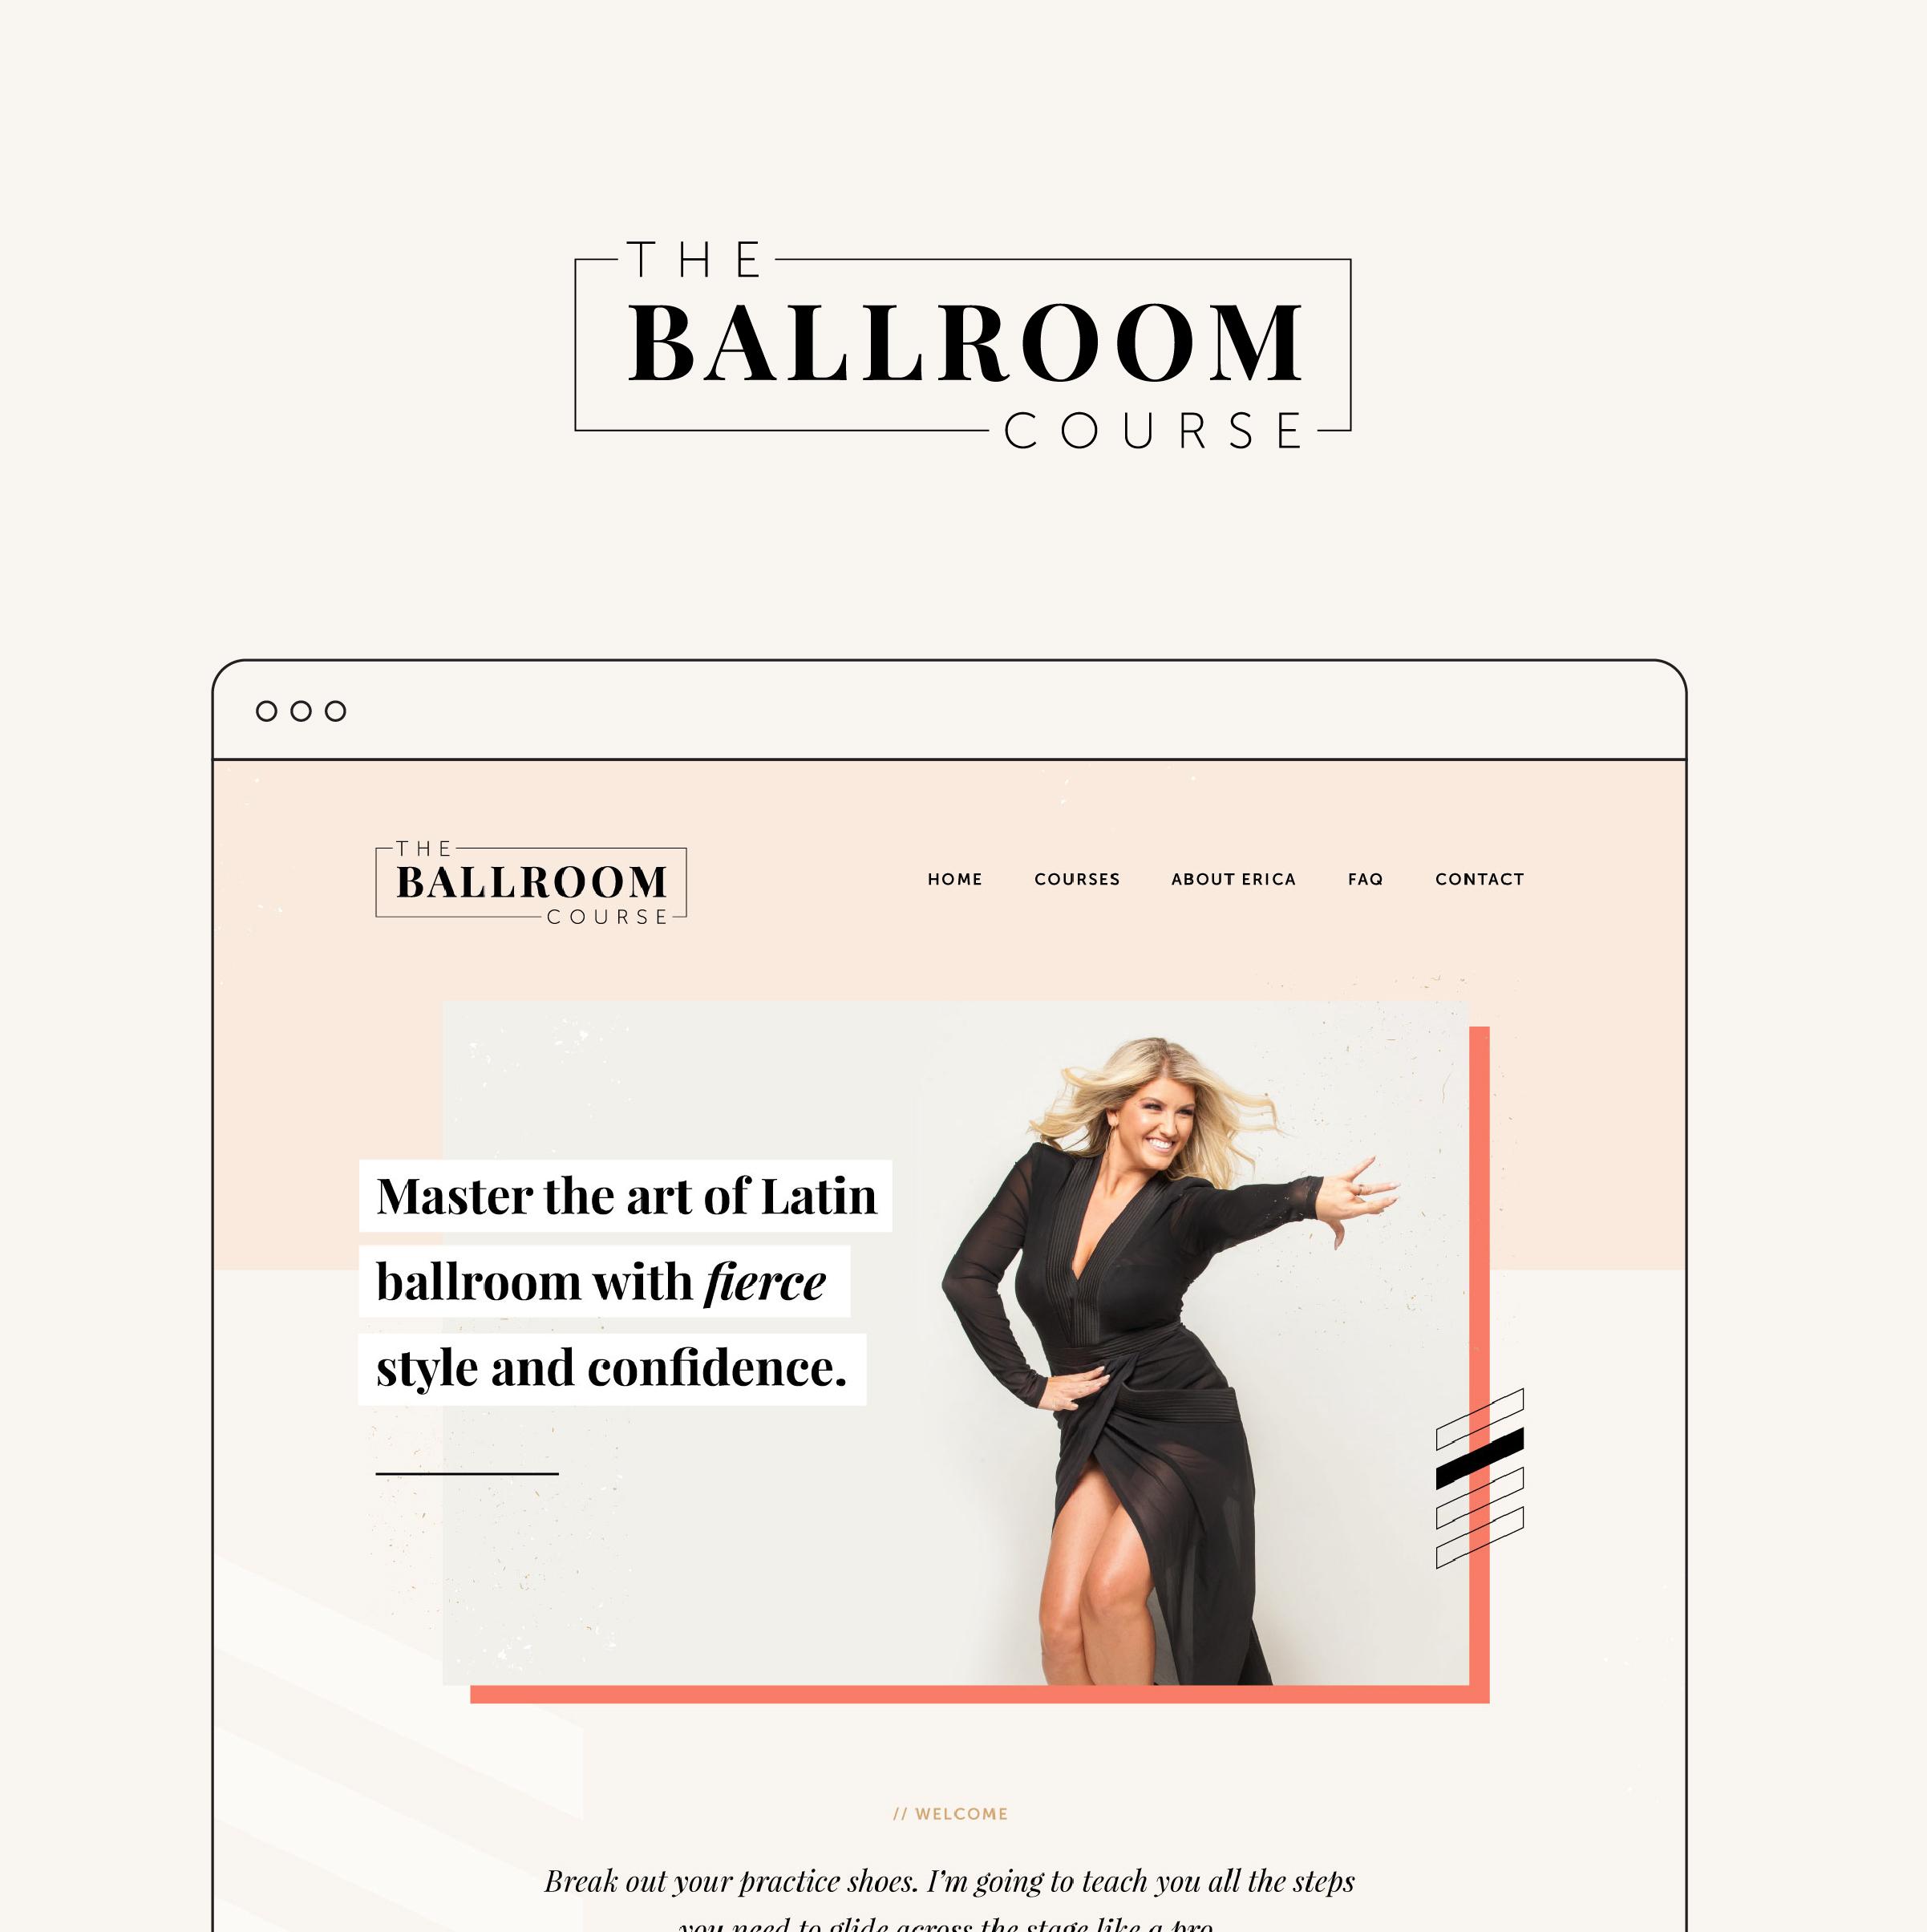 TheBallroomCourse_IG_Swipes_1.jpg